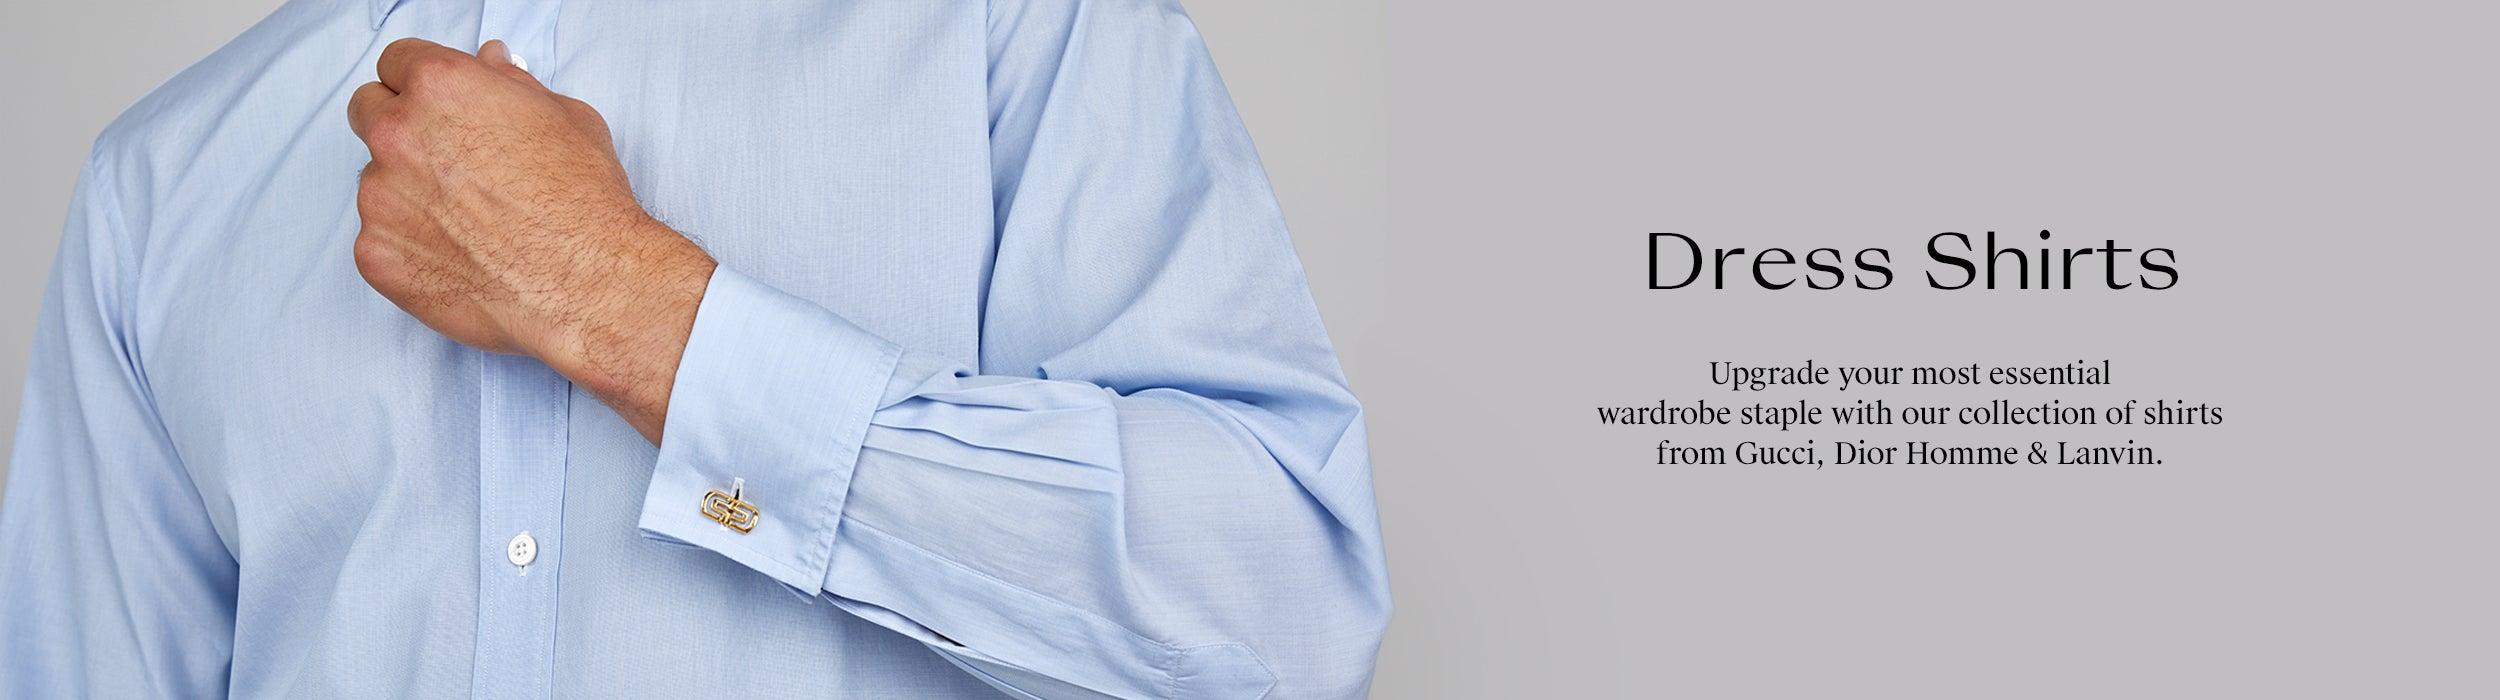 ad9545c4a1b5 Men s Dress Shirts